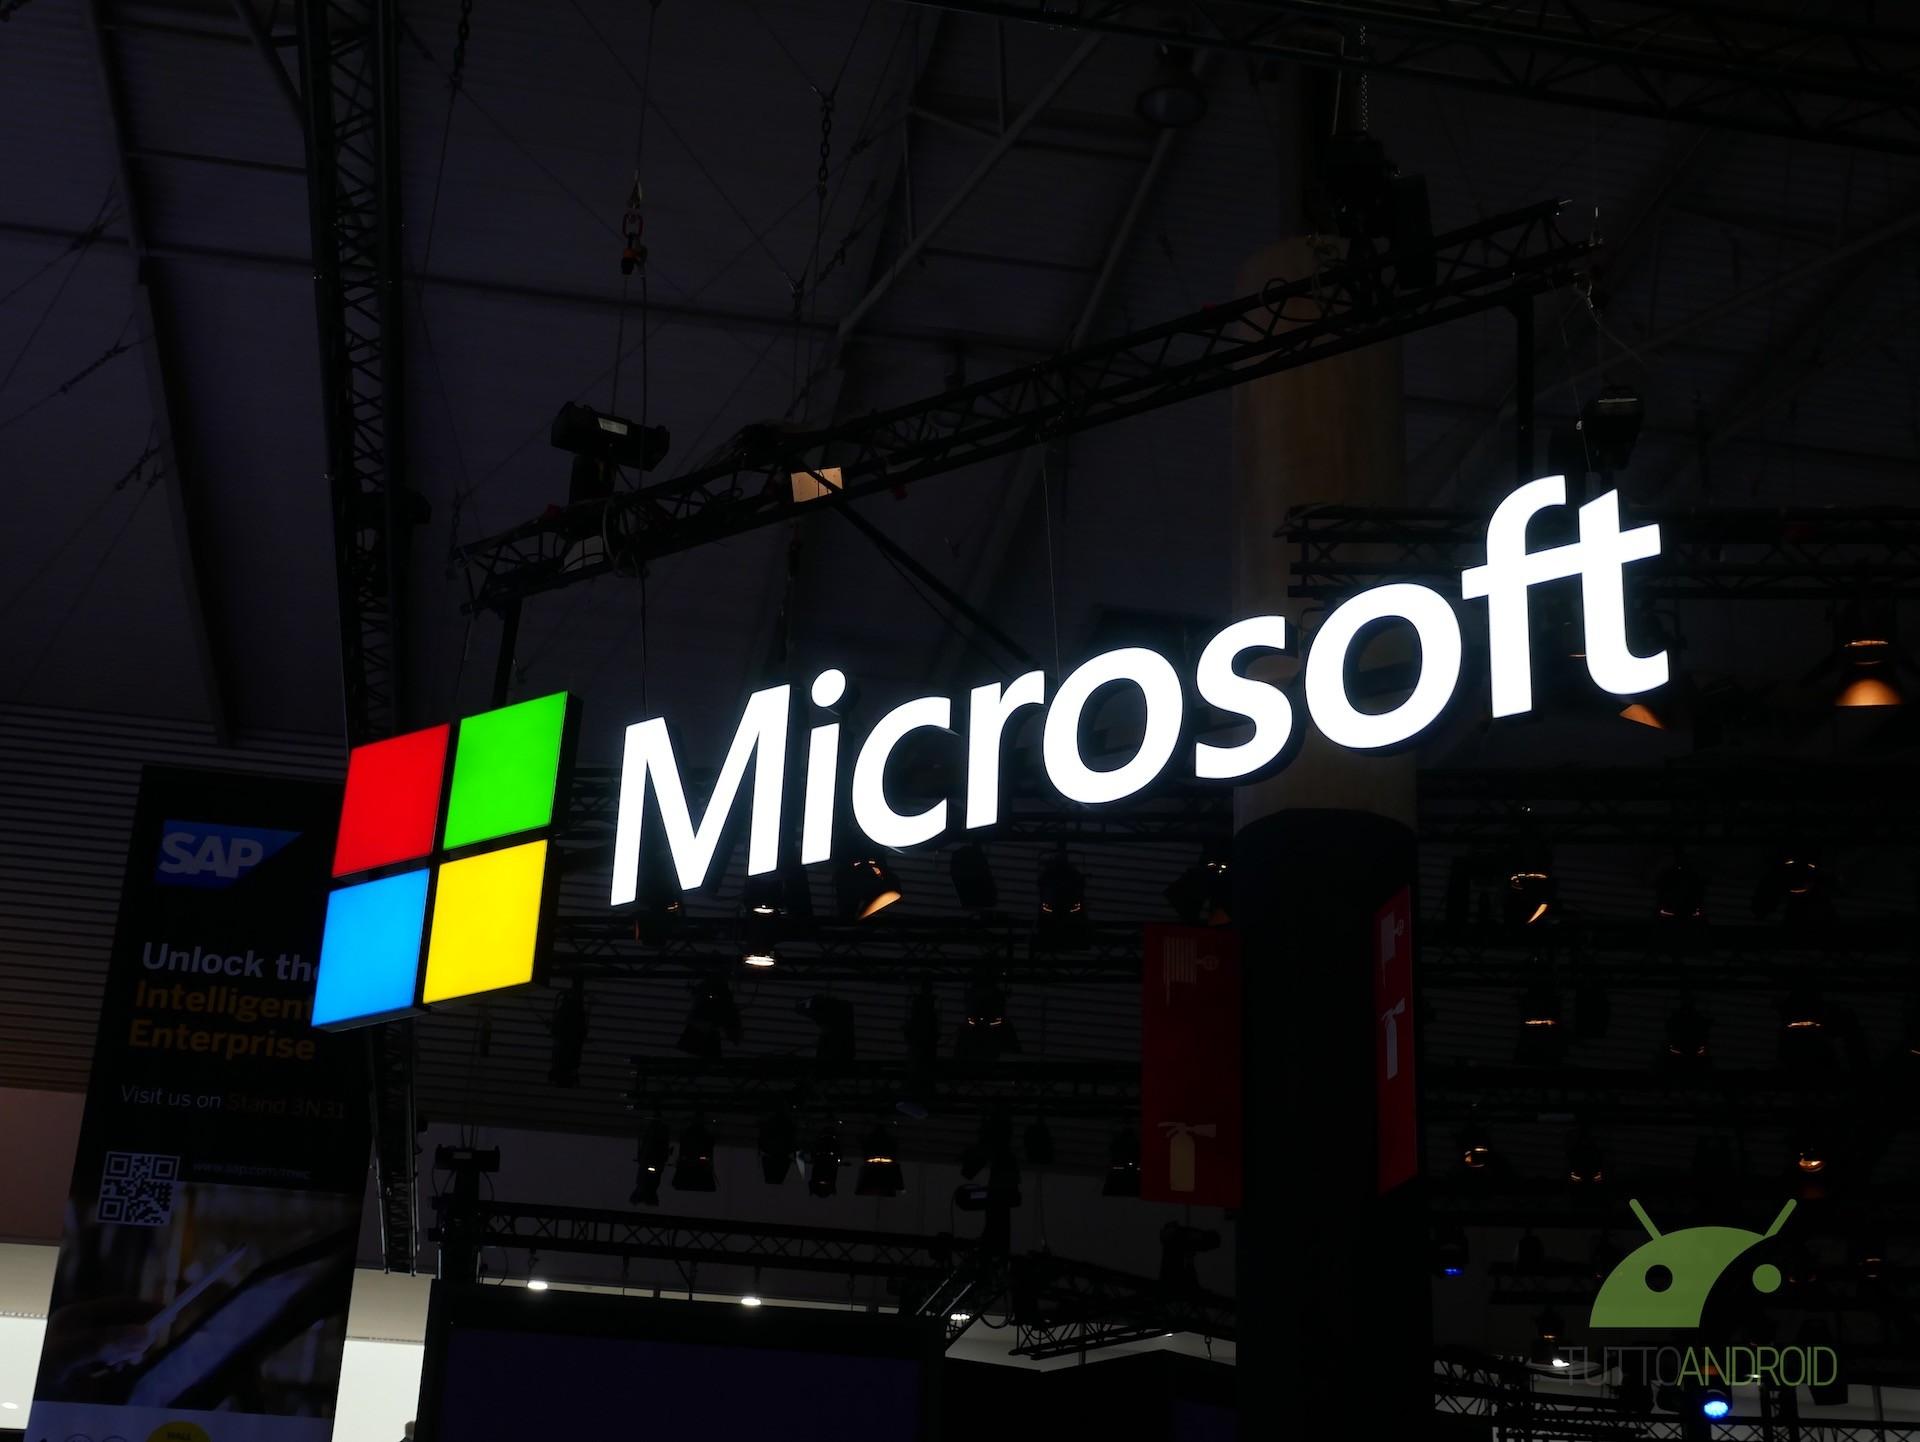 Defender, l'antivirus di Microsoft, è in arrivo sugli smartp